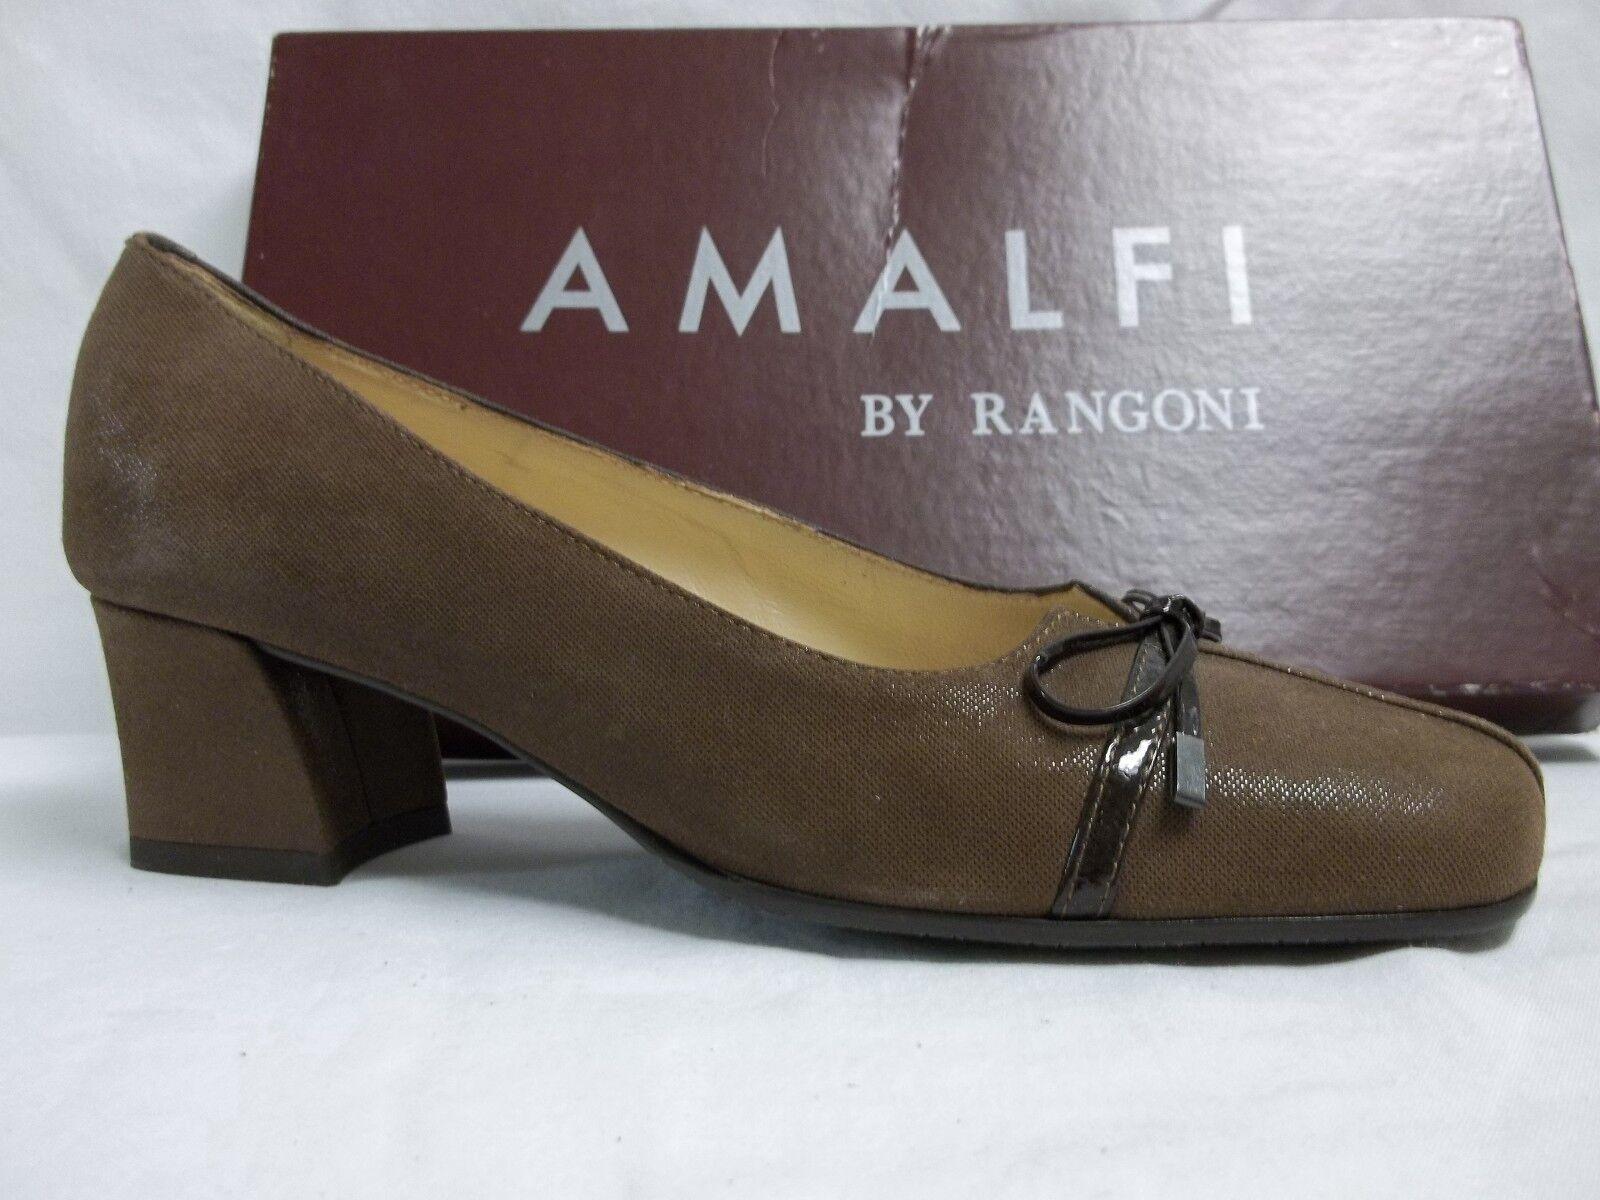 Amalfi By Rangoni Größe 6 M Chamy Damenschuhe Cacao Pumps New Damenschuhe Chamy Schuhes 658c93